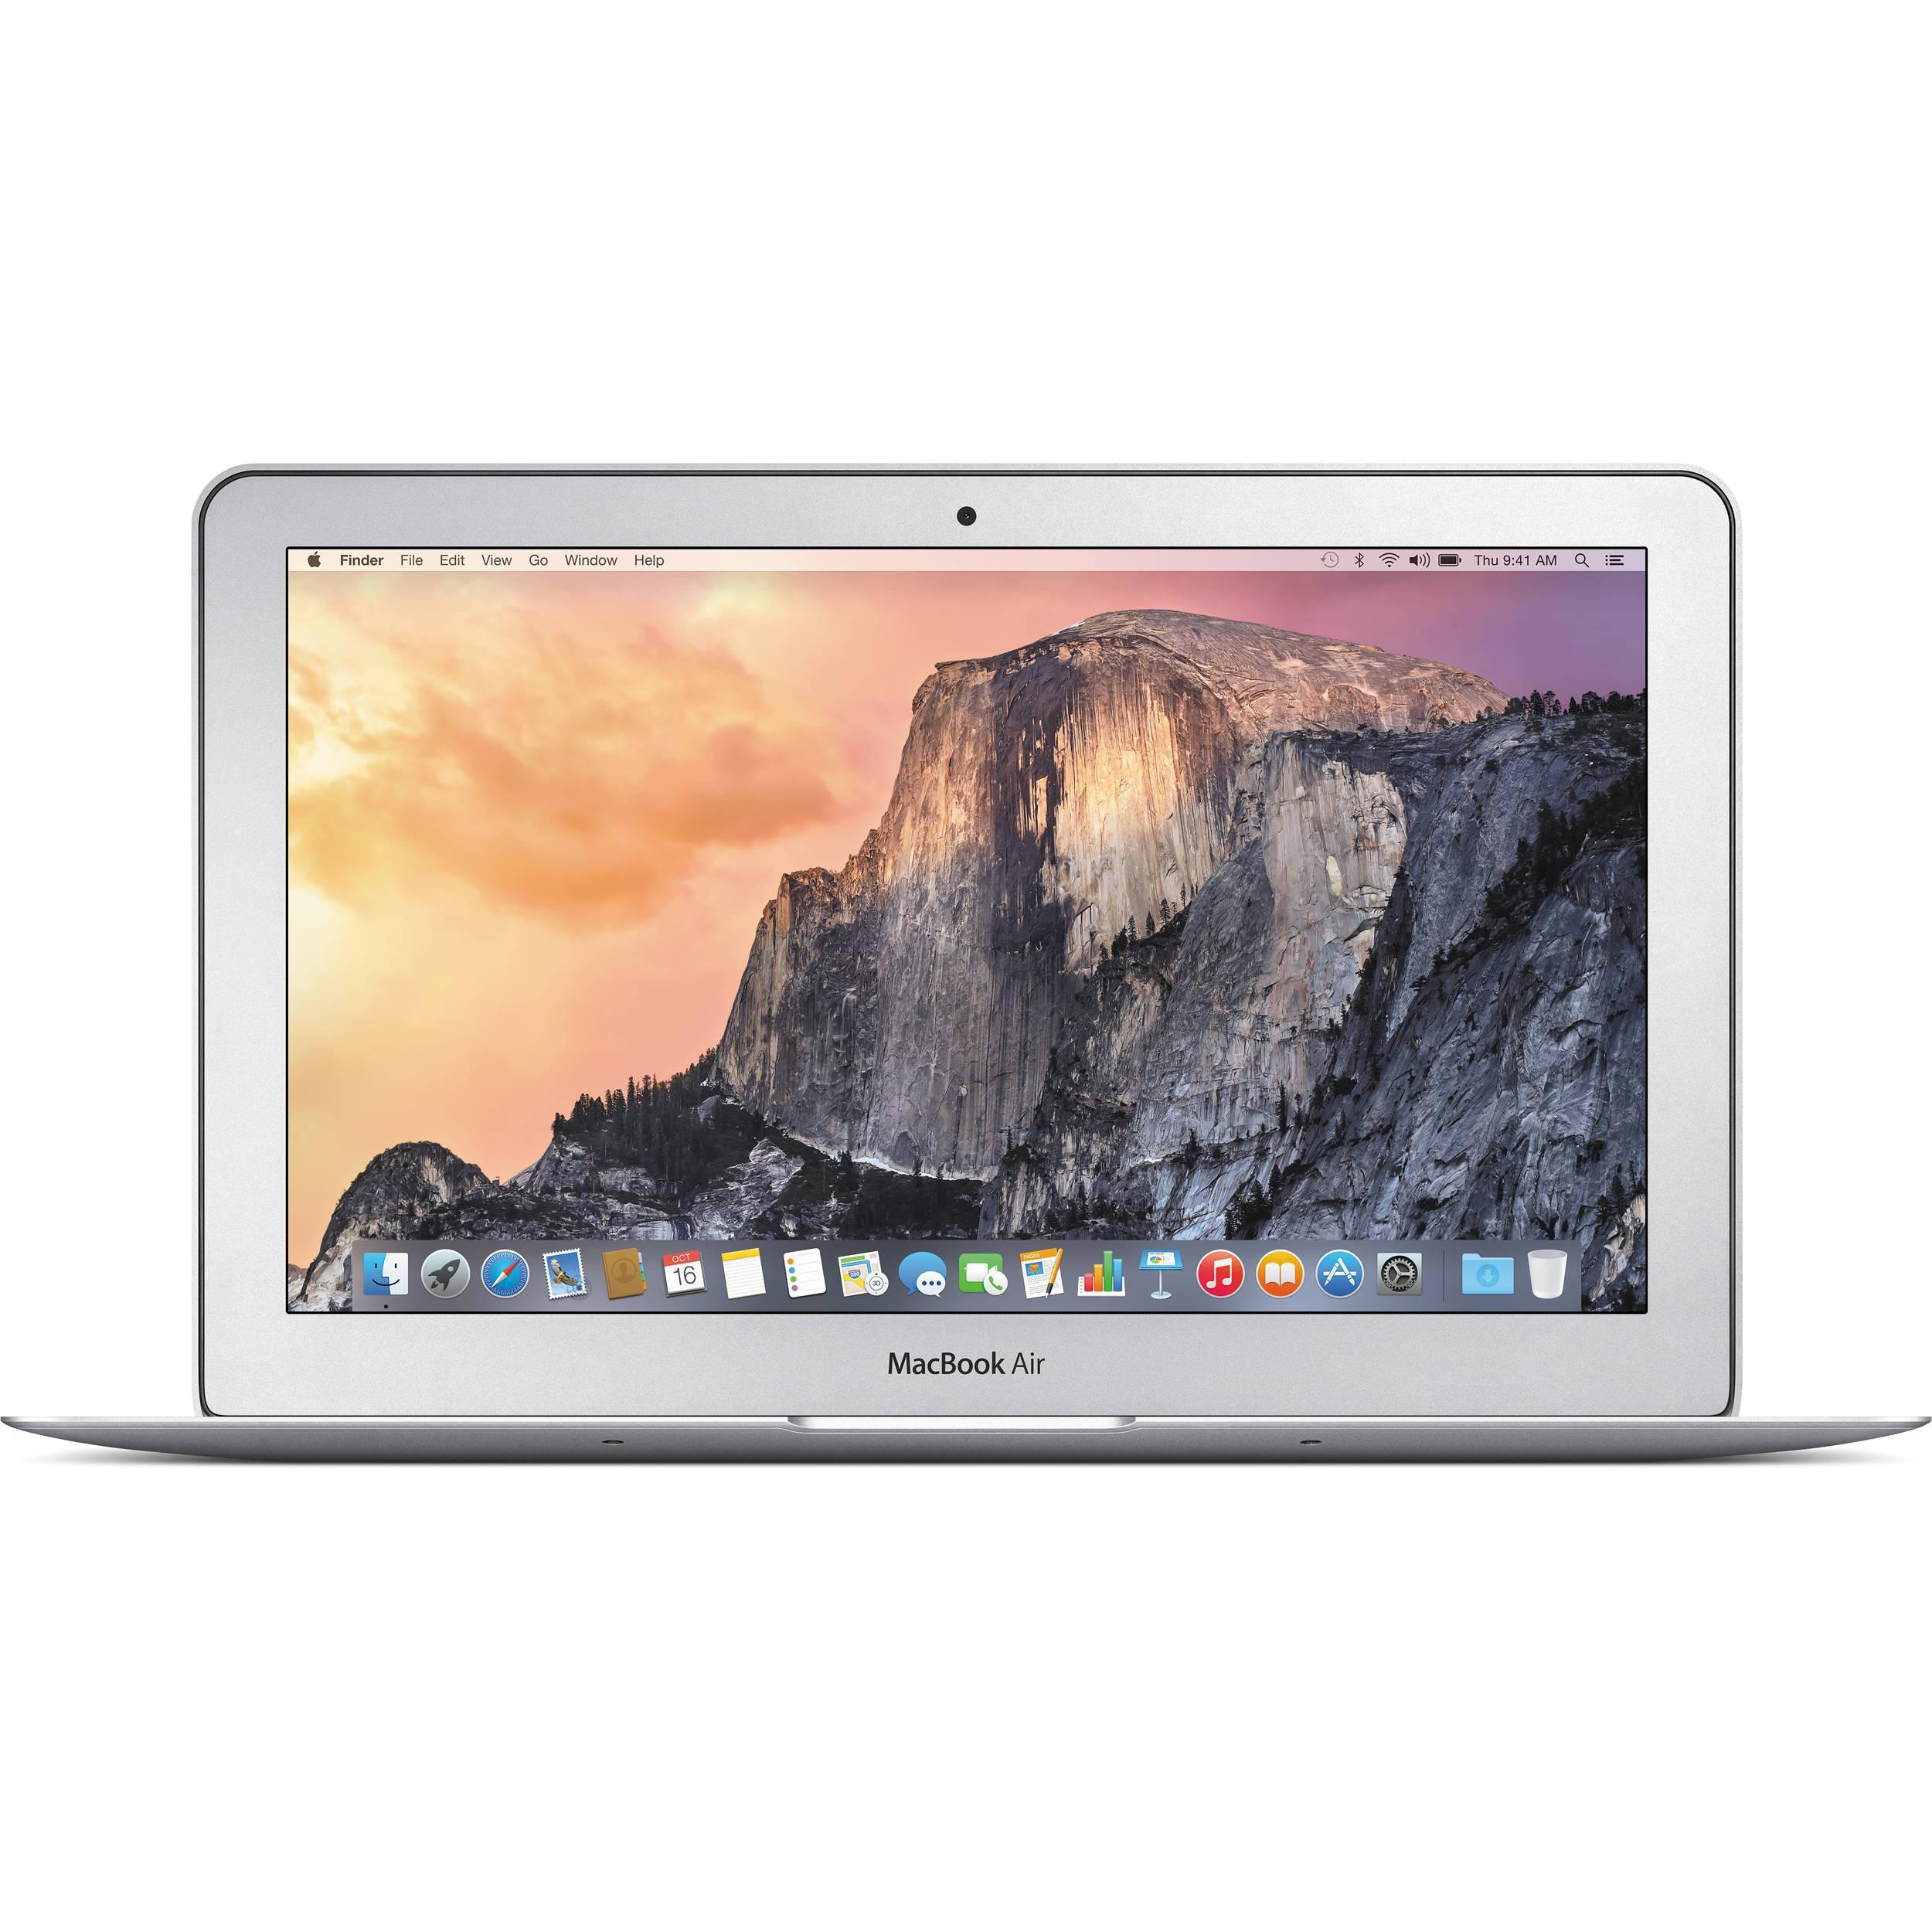 "MacBook Air 11,6"" (2013) - Core i5 - 4GB - SSD 128 GB QWERTZ - Nemecká"